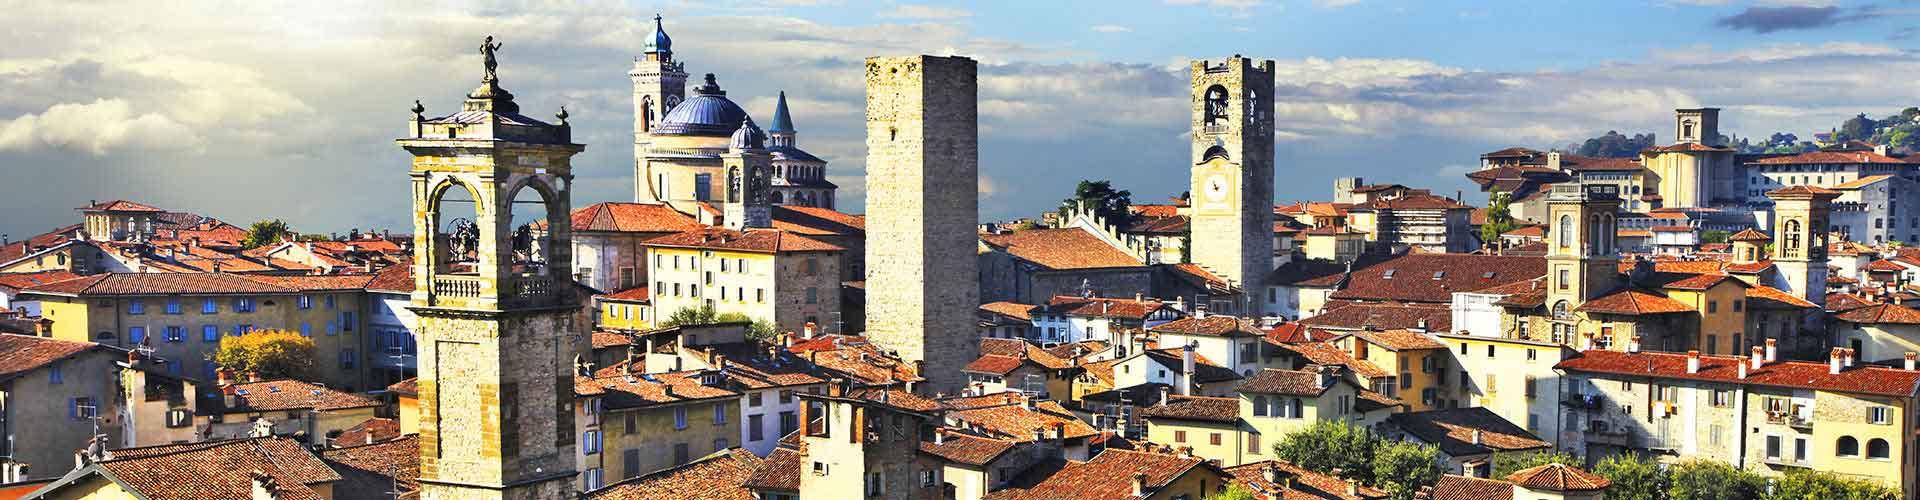 Bergamo - Hoteles baratos en Bergamo. Mapas de Bergamo, Fotos y comentarios de cada Hotel en Bergamo.